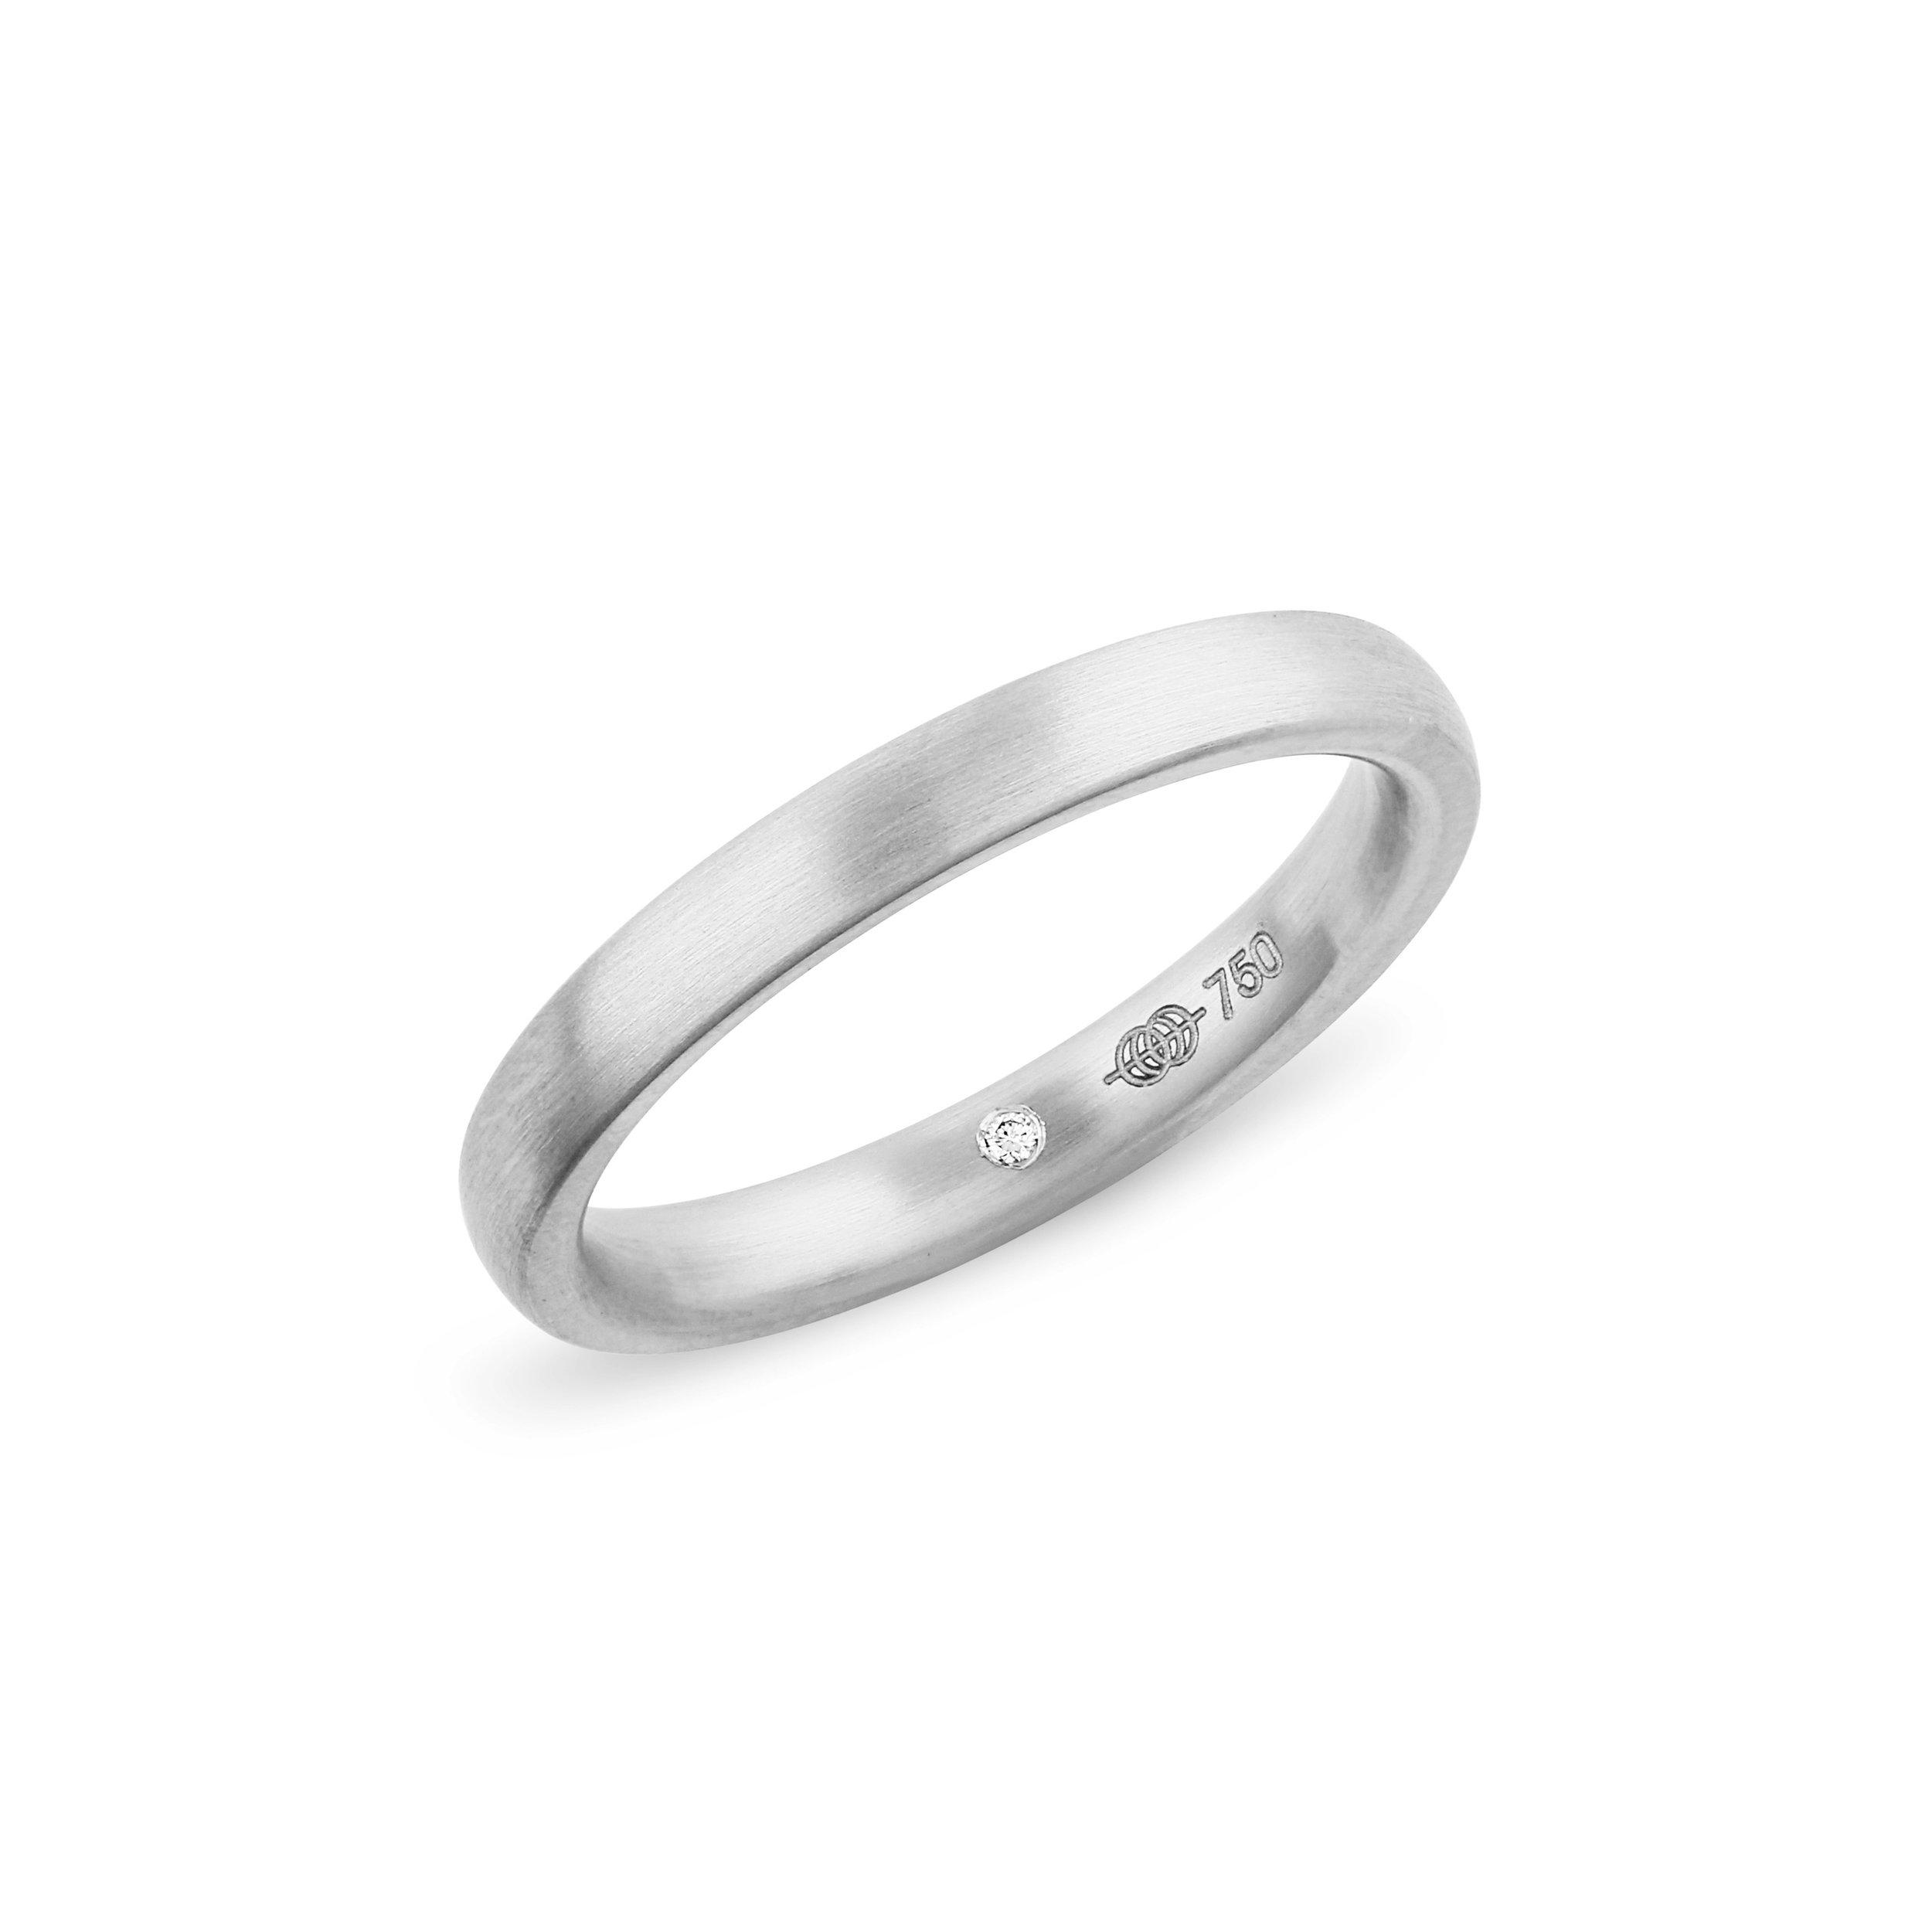 derby_wedding_ring_state_property_white.jpg